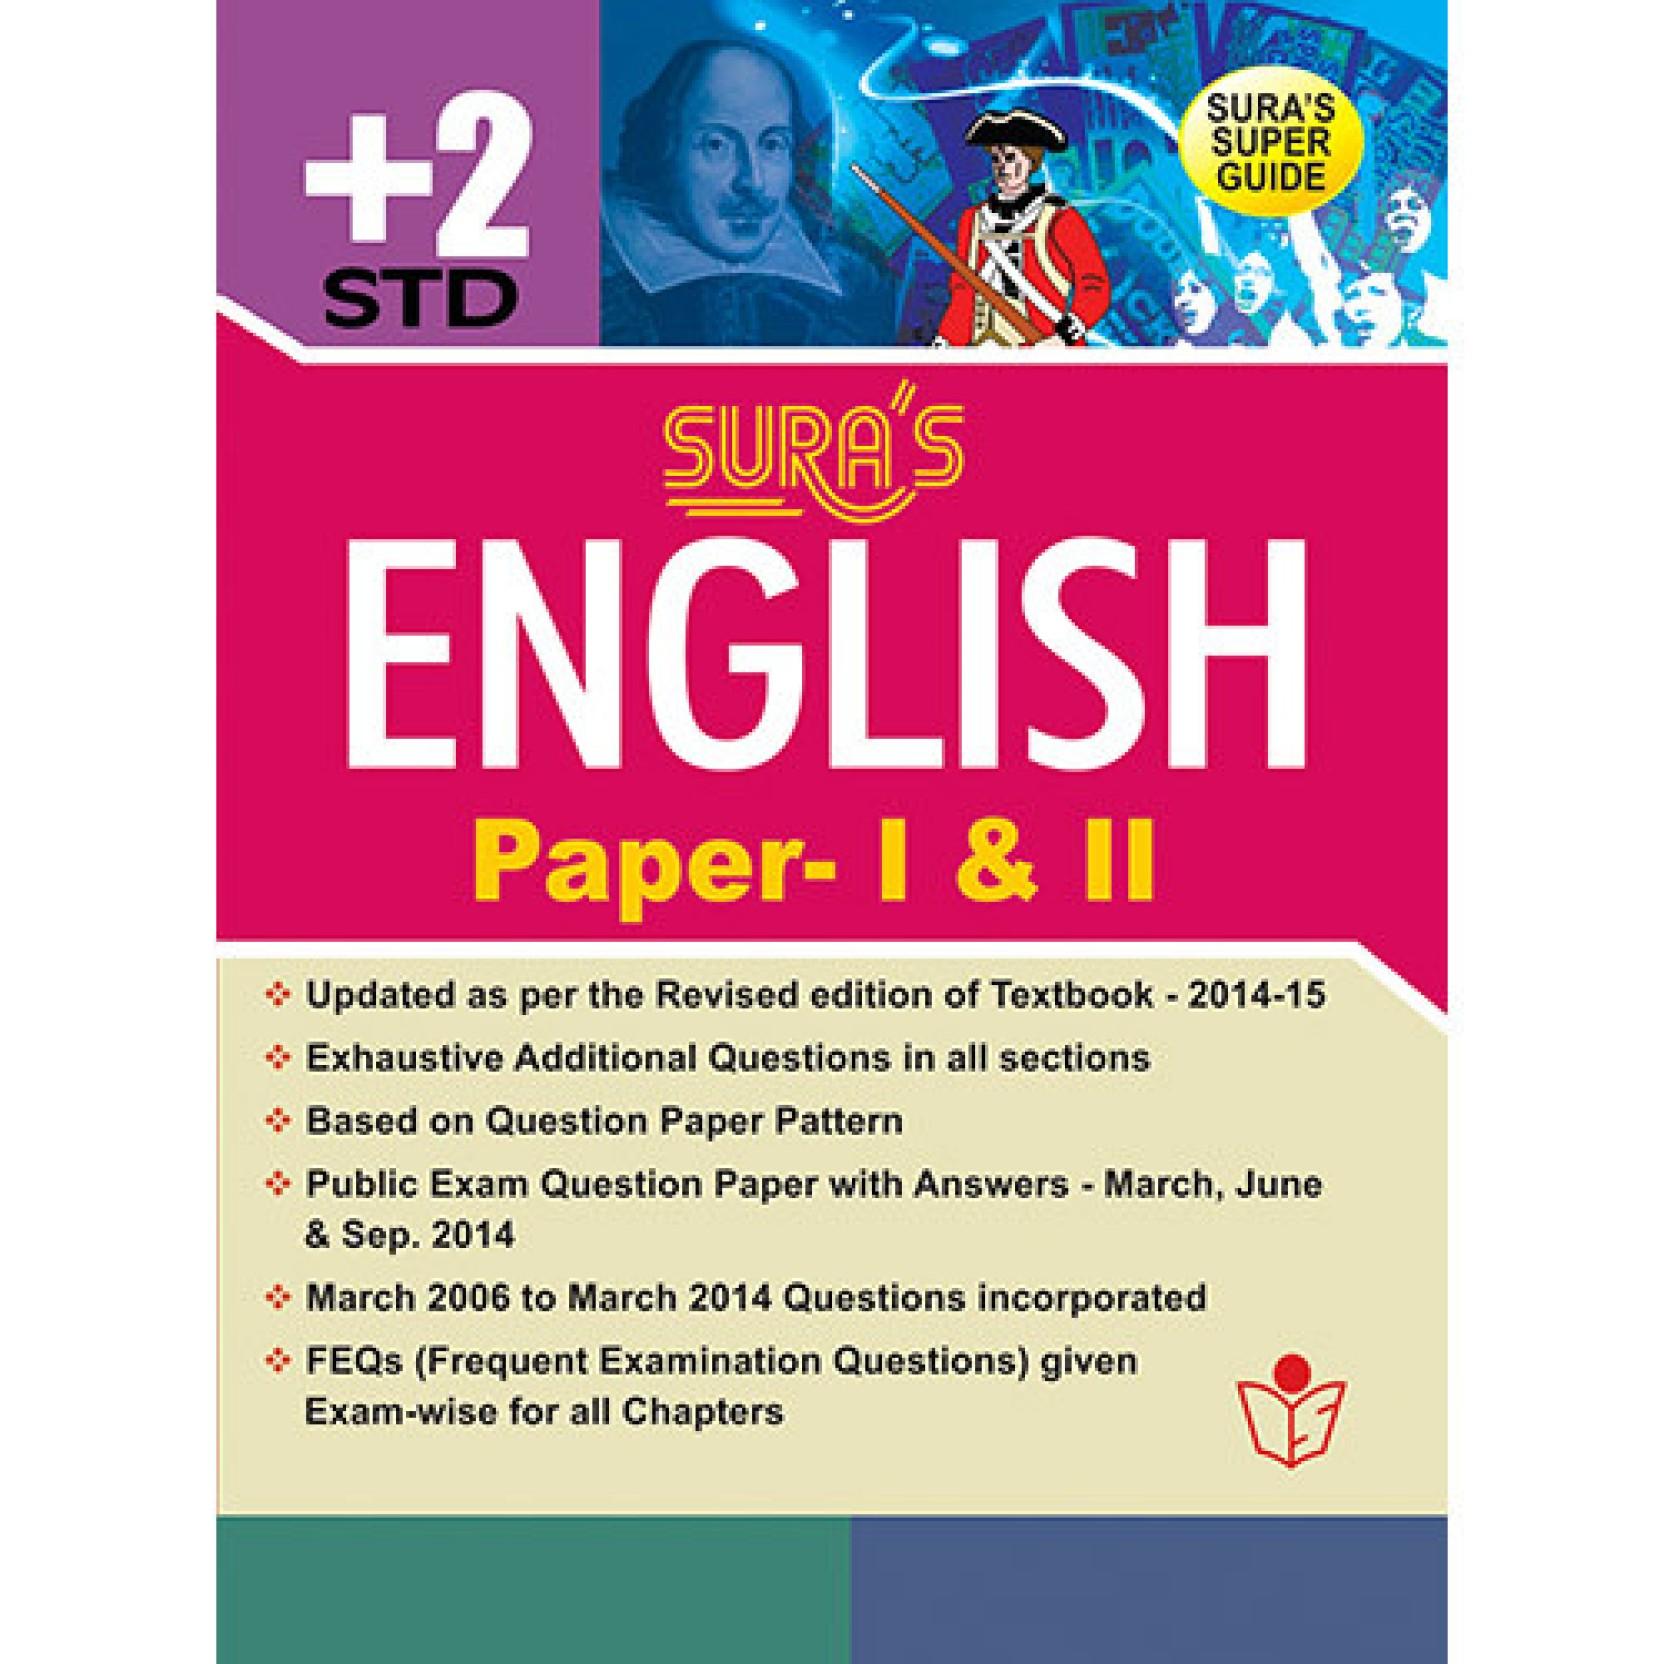 Sura's English Paper I & II Complete Guide. Home